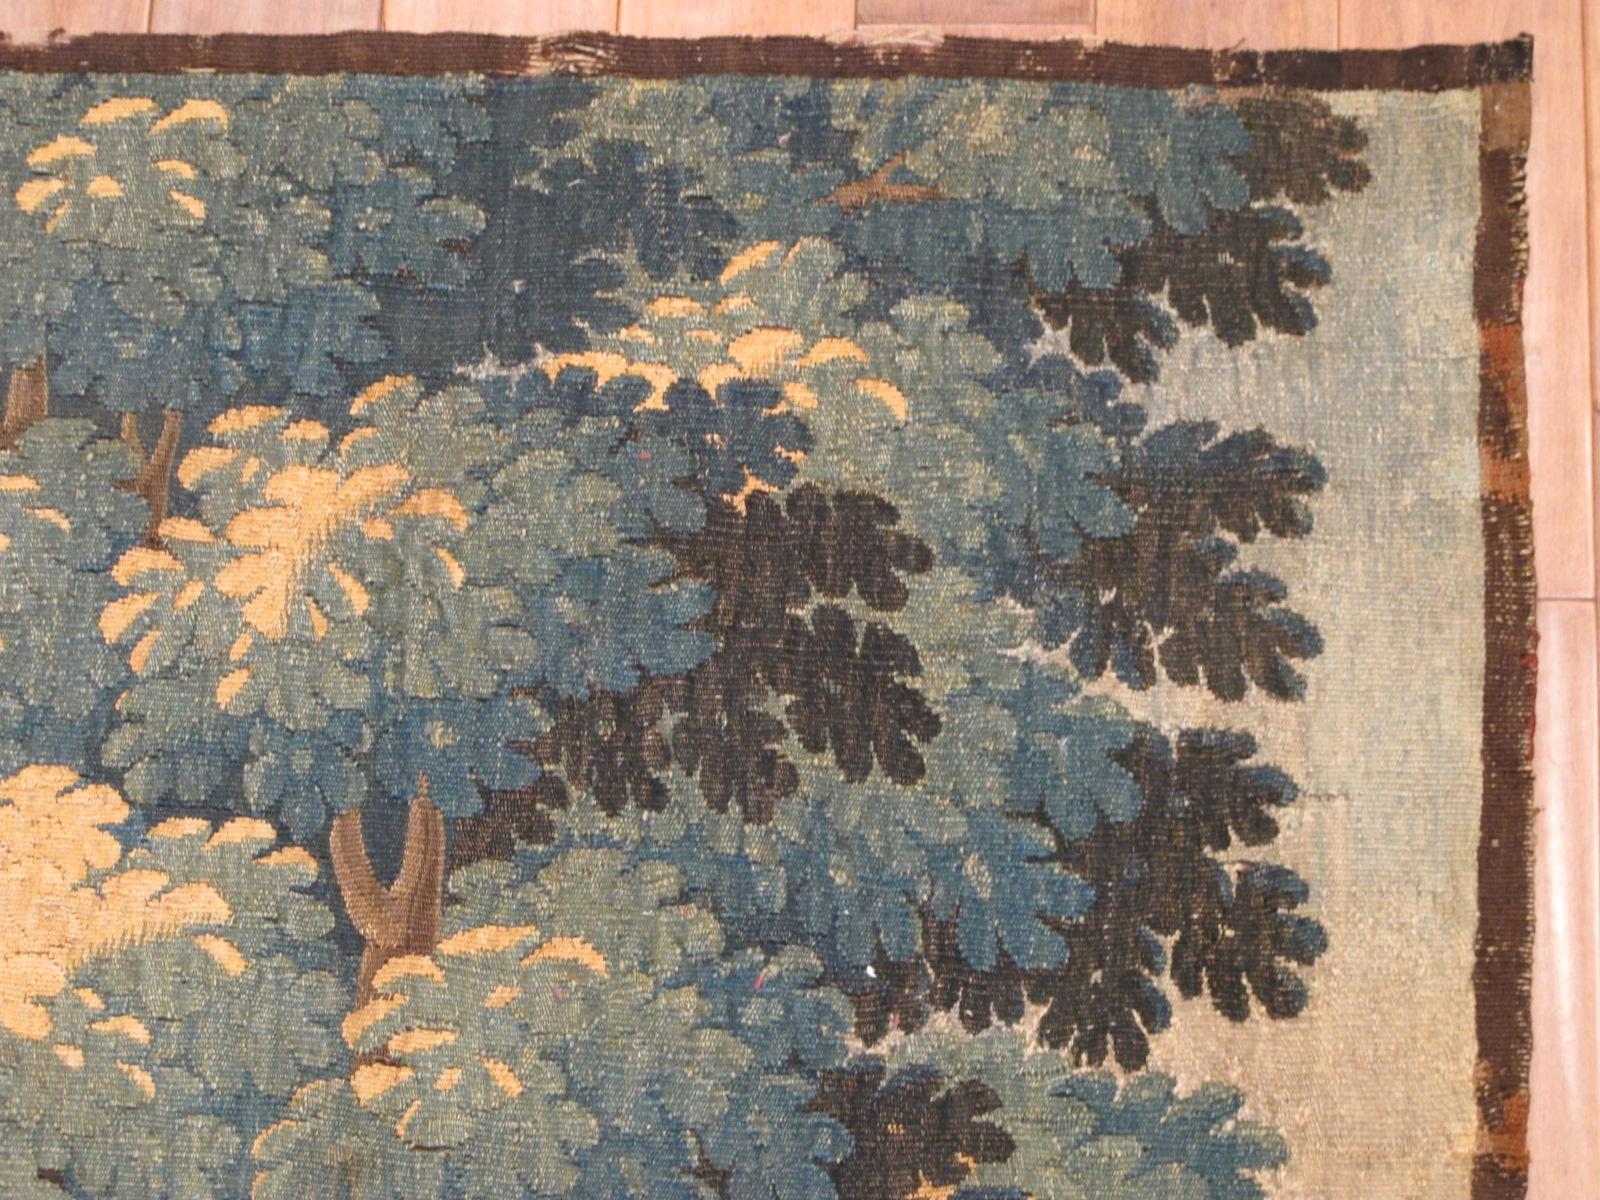 23041 antique european Tapestry 6'7x6'7 (4)